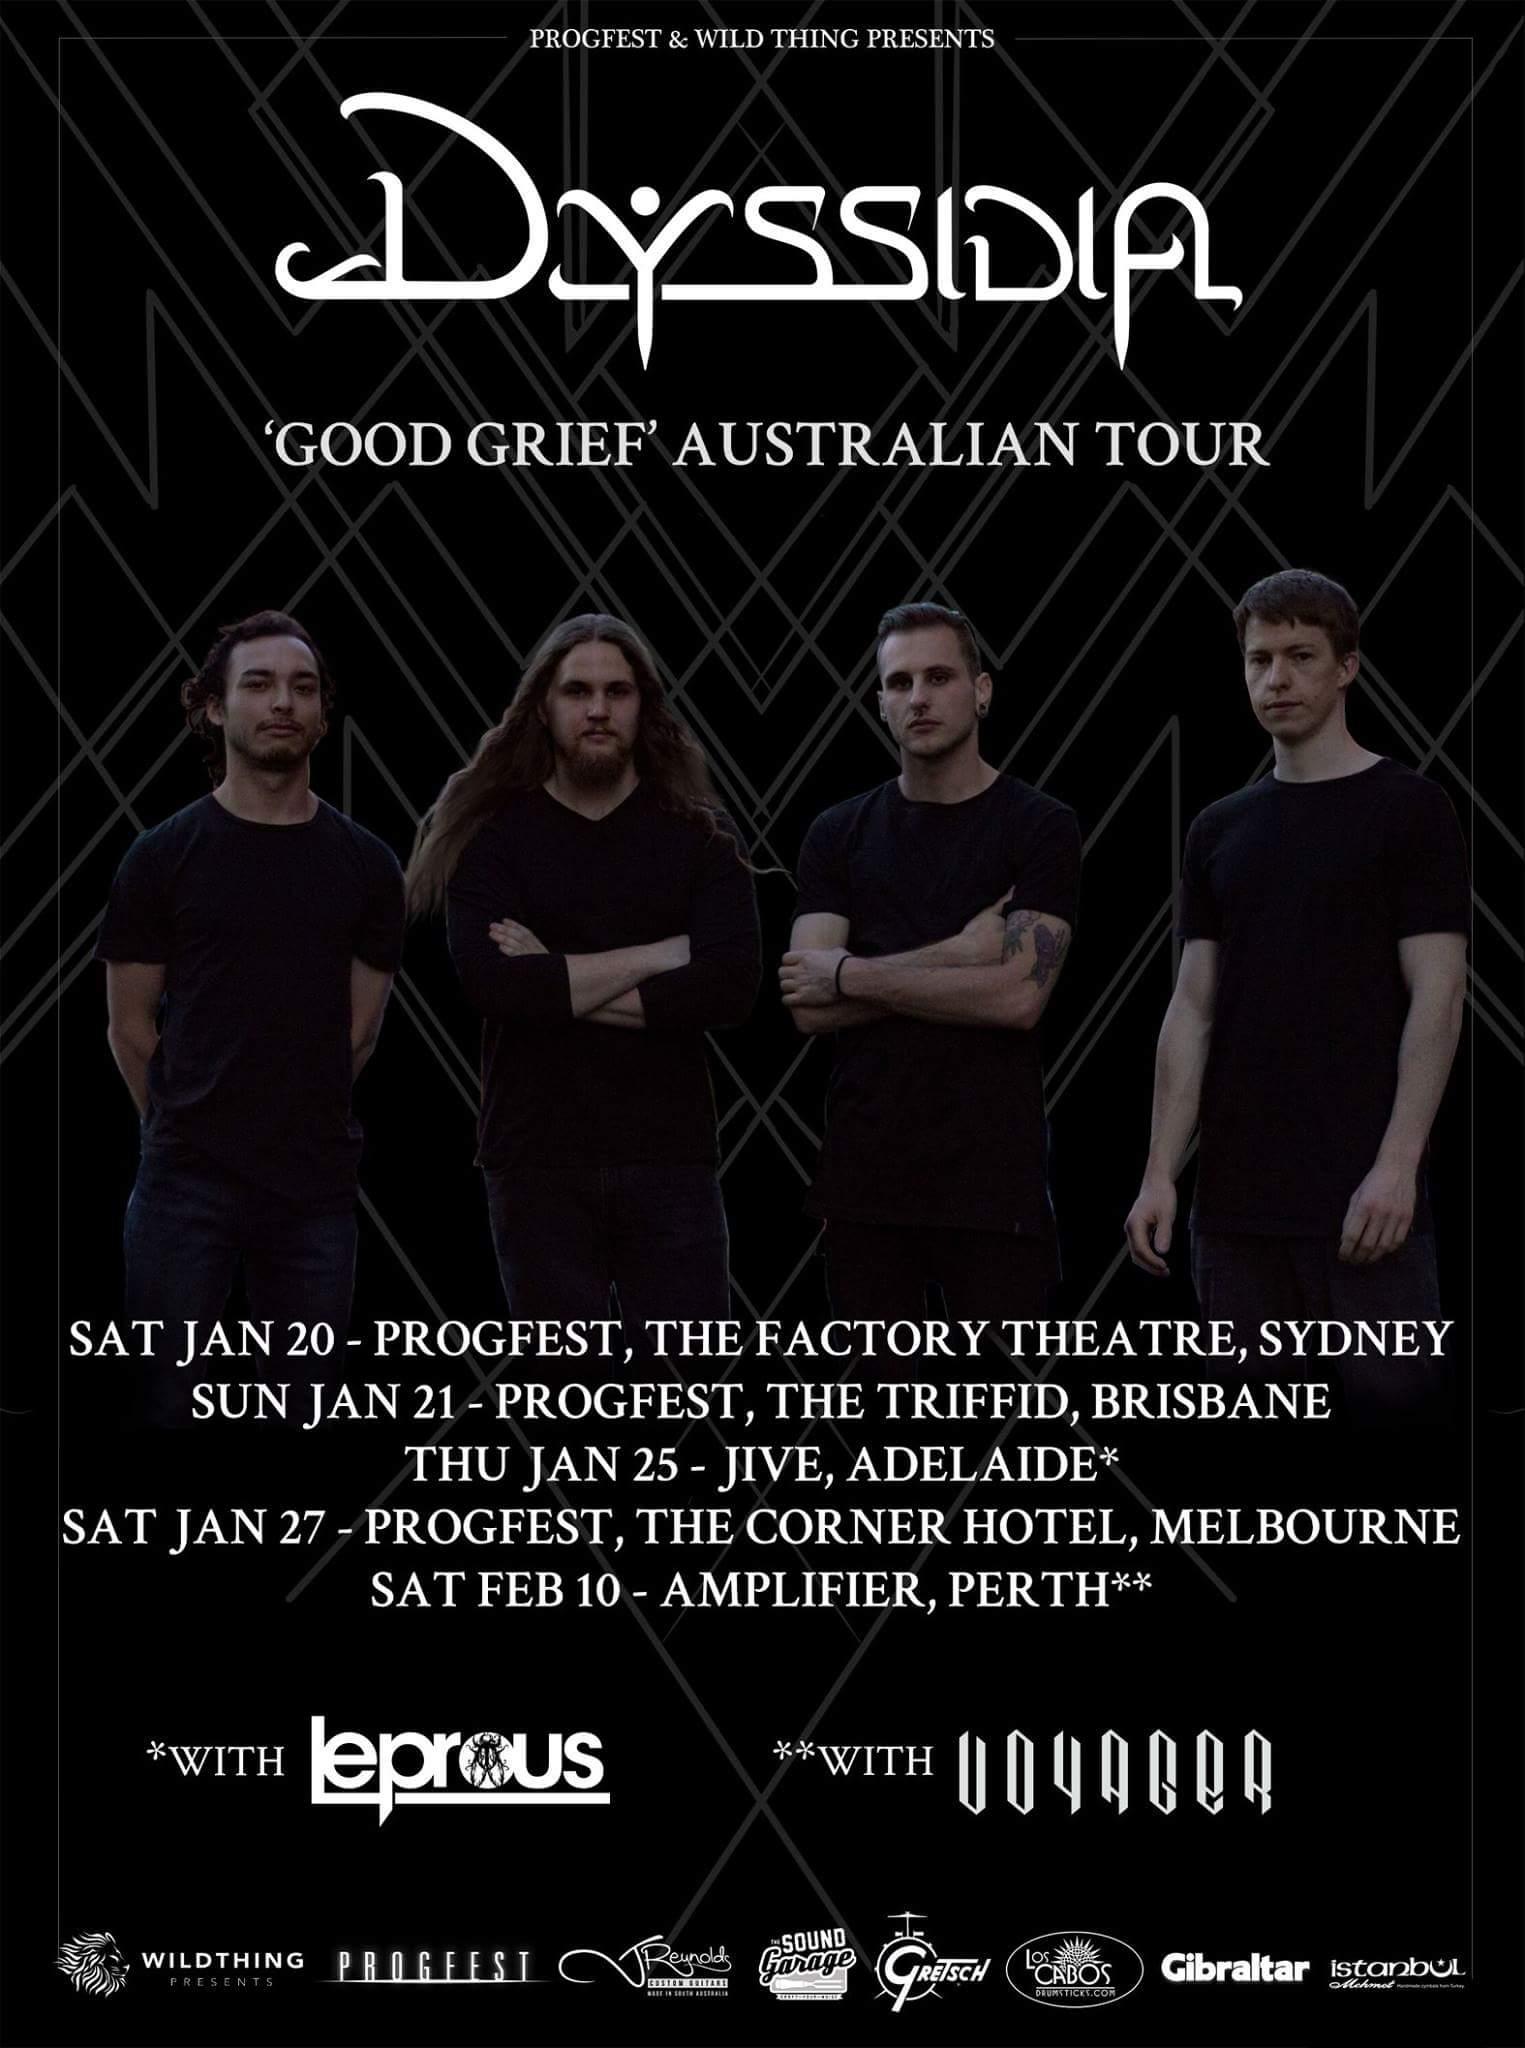 Dyssidia Jan-Feb tour poster.jpg